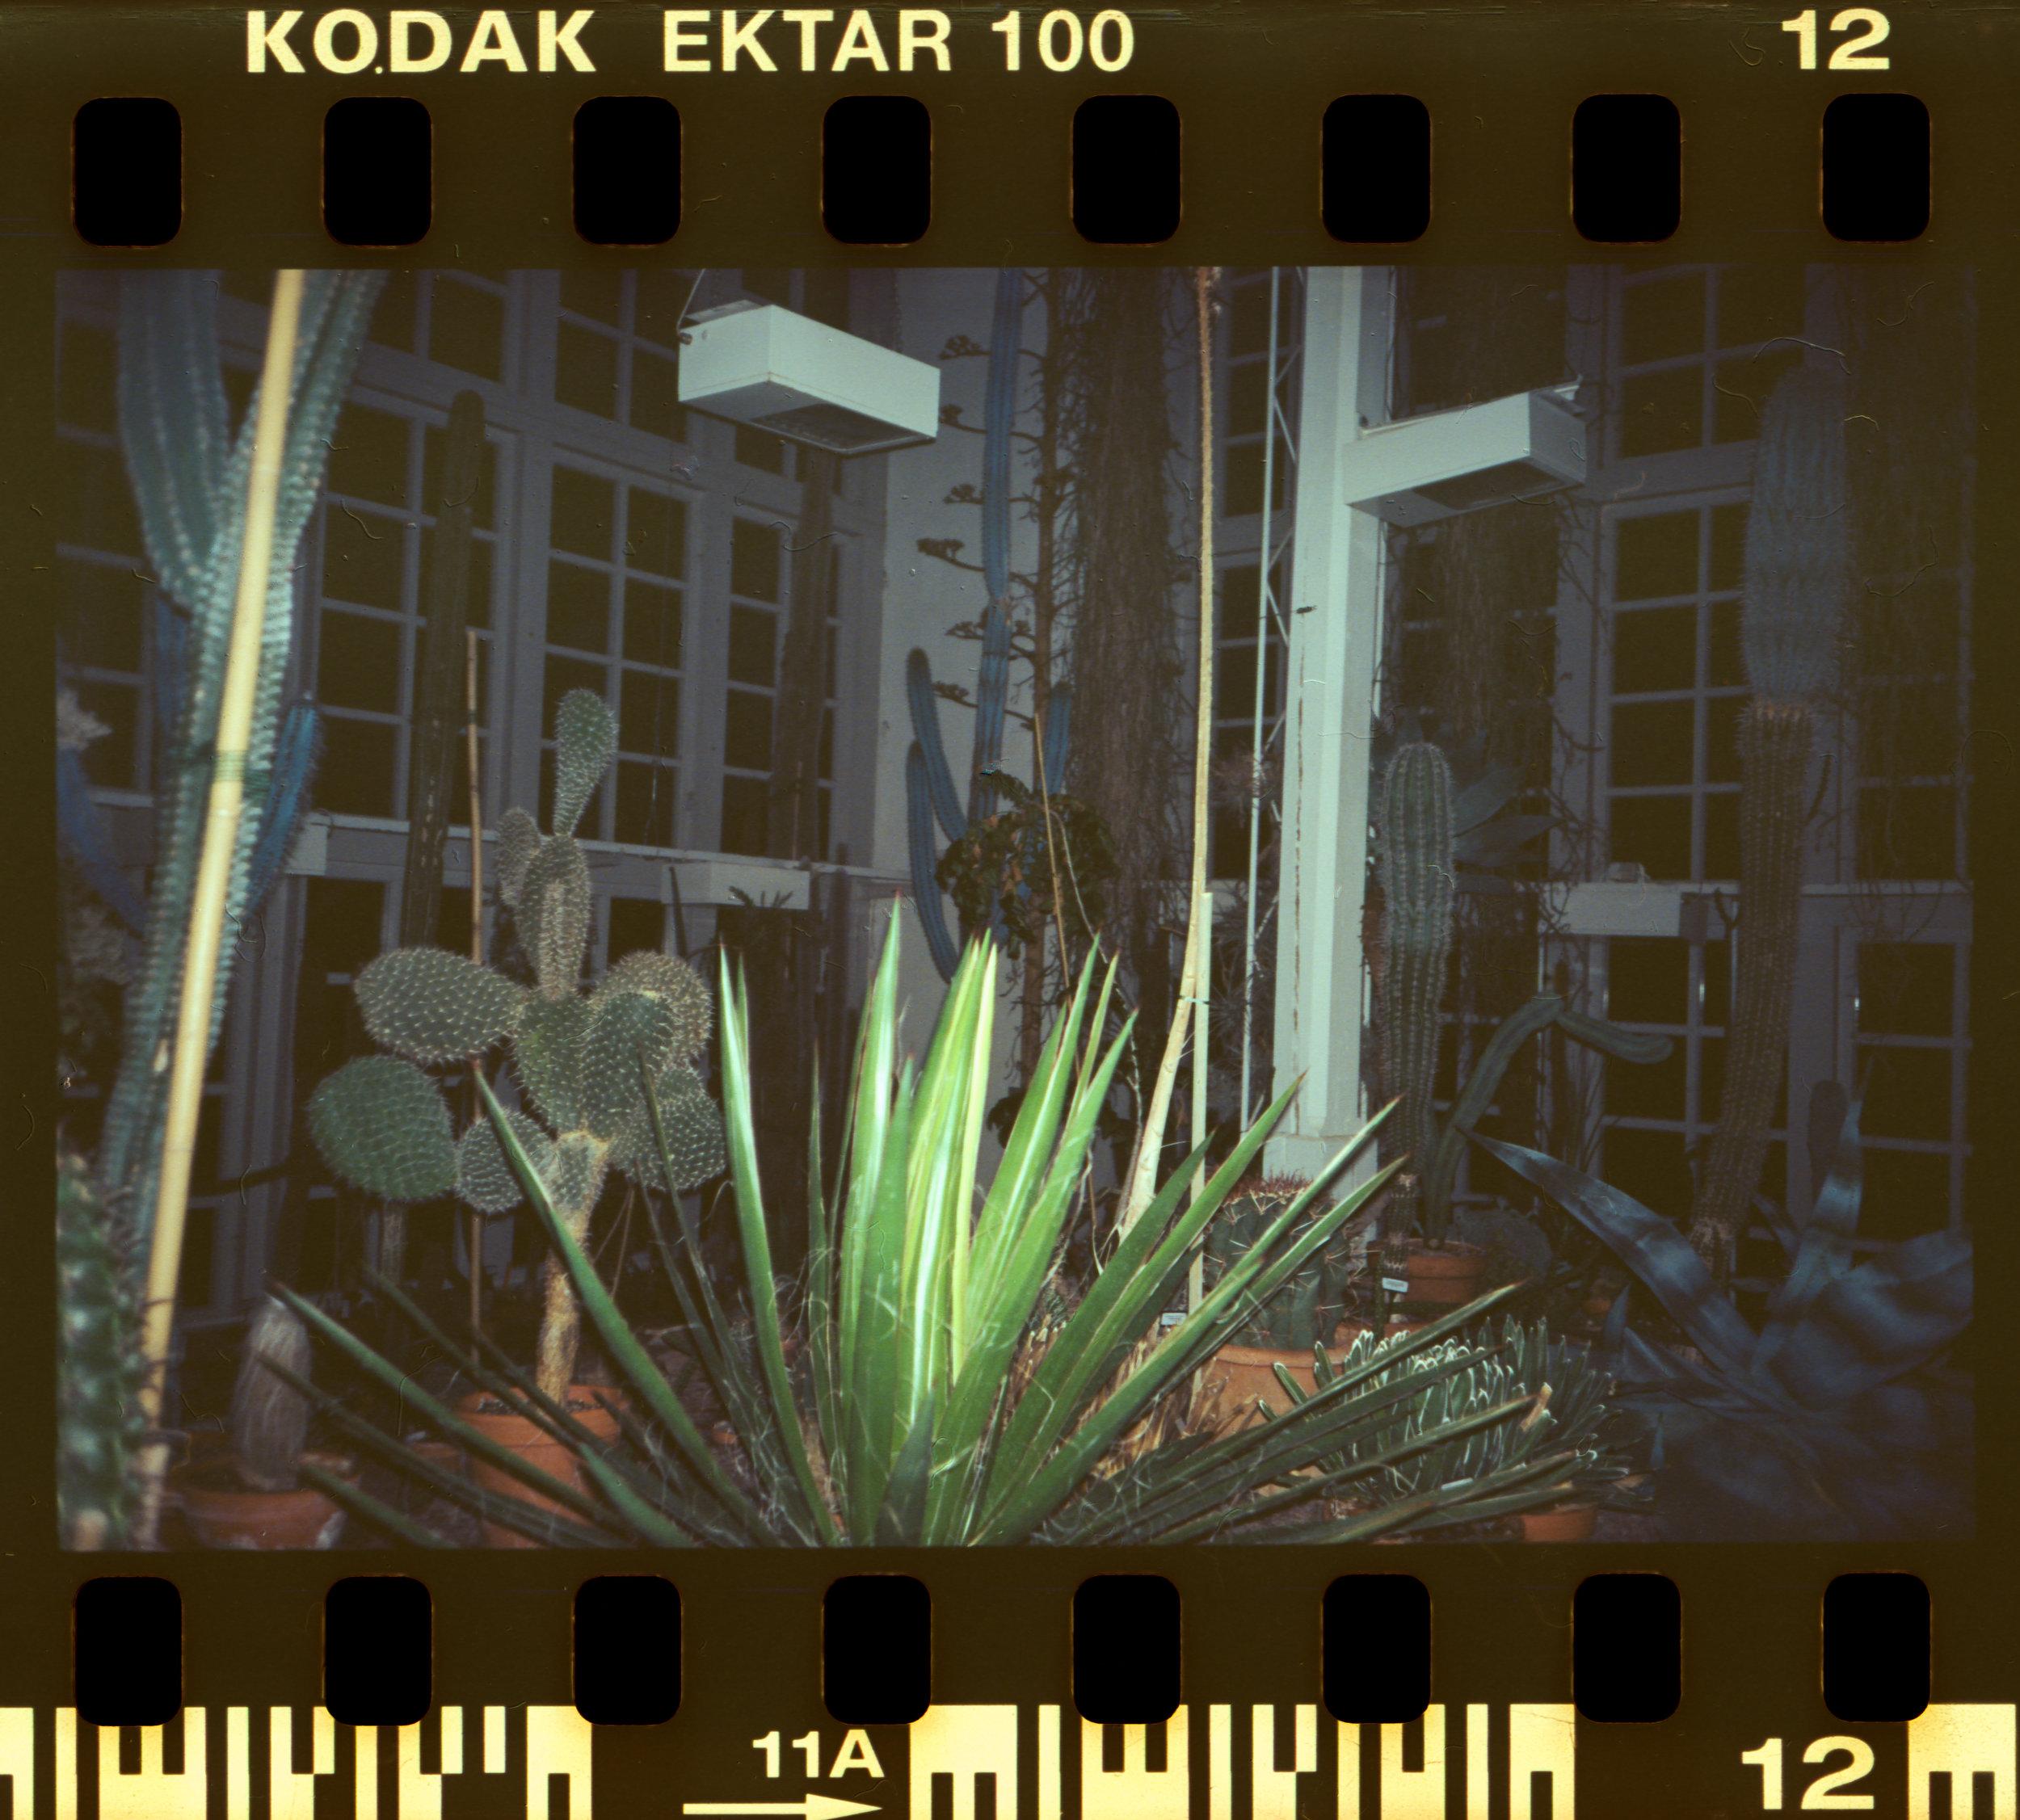 Botaniska II / Kodak Ektar 100 / Olympus Mju I